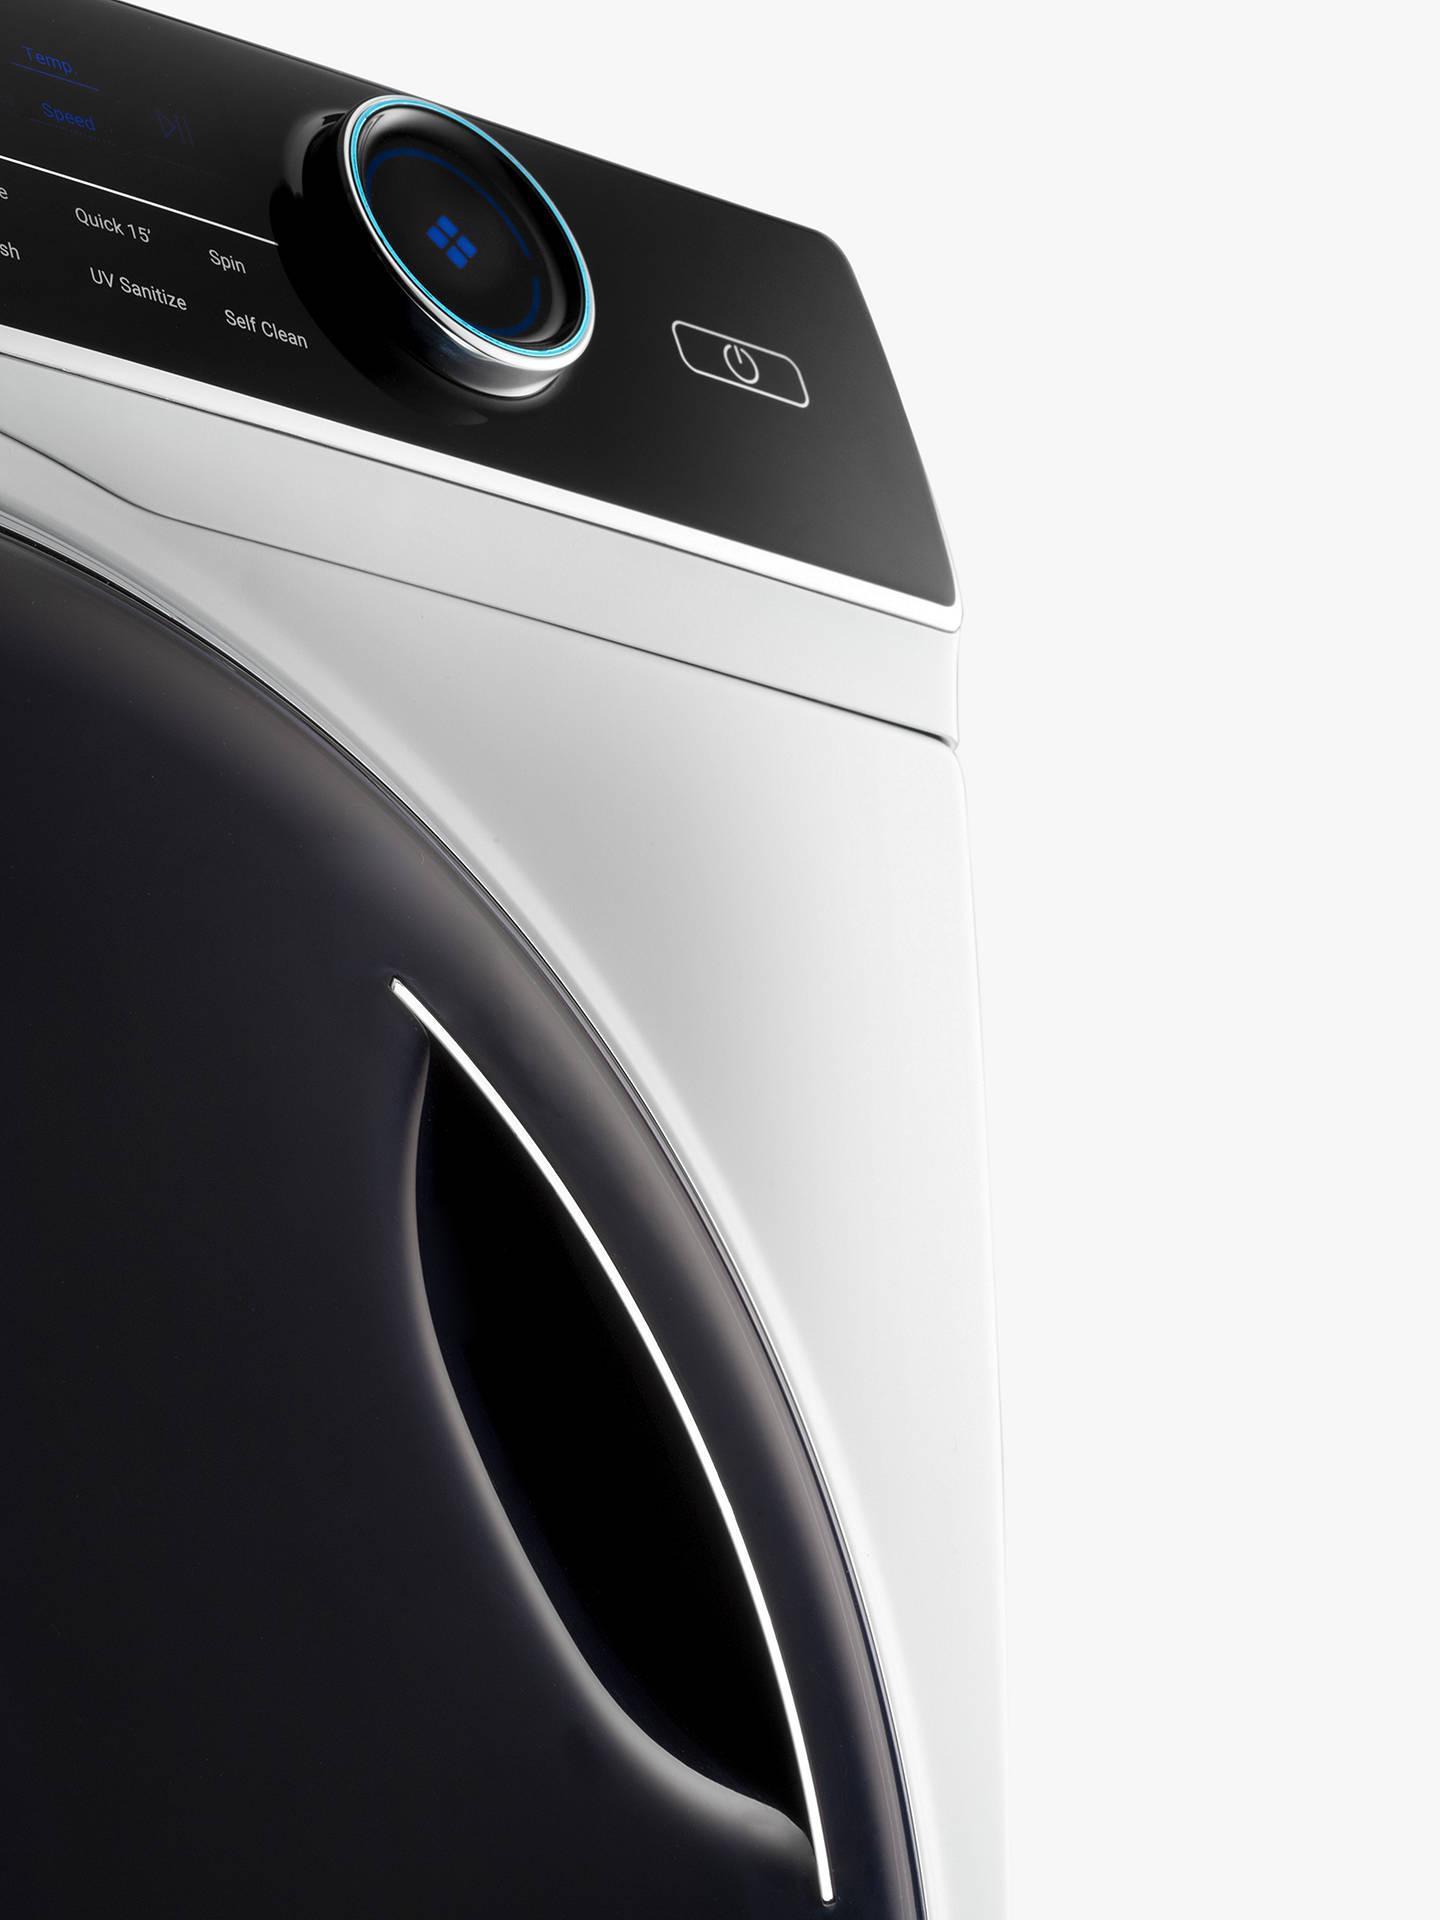 Haier Washing Machine Buy Online